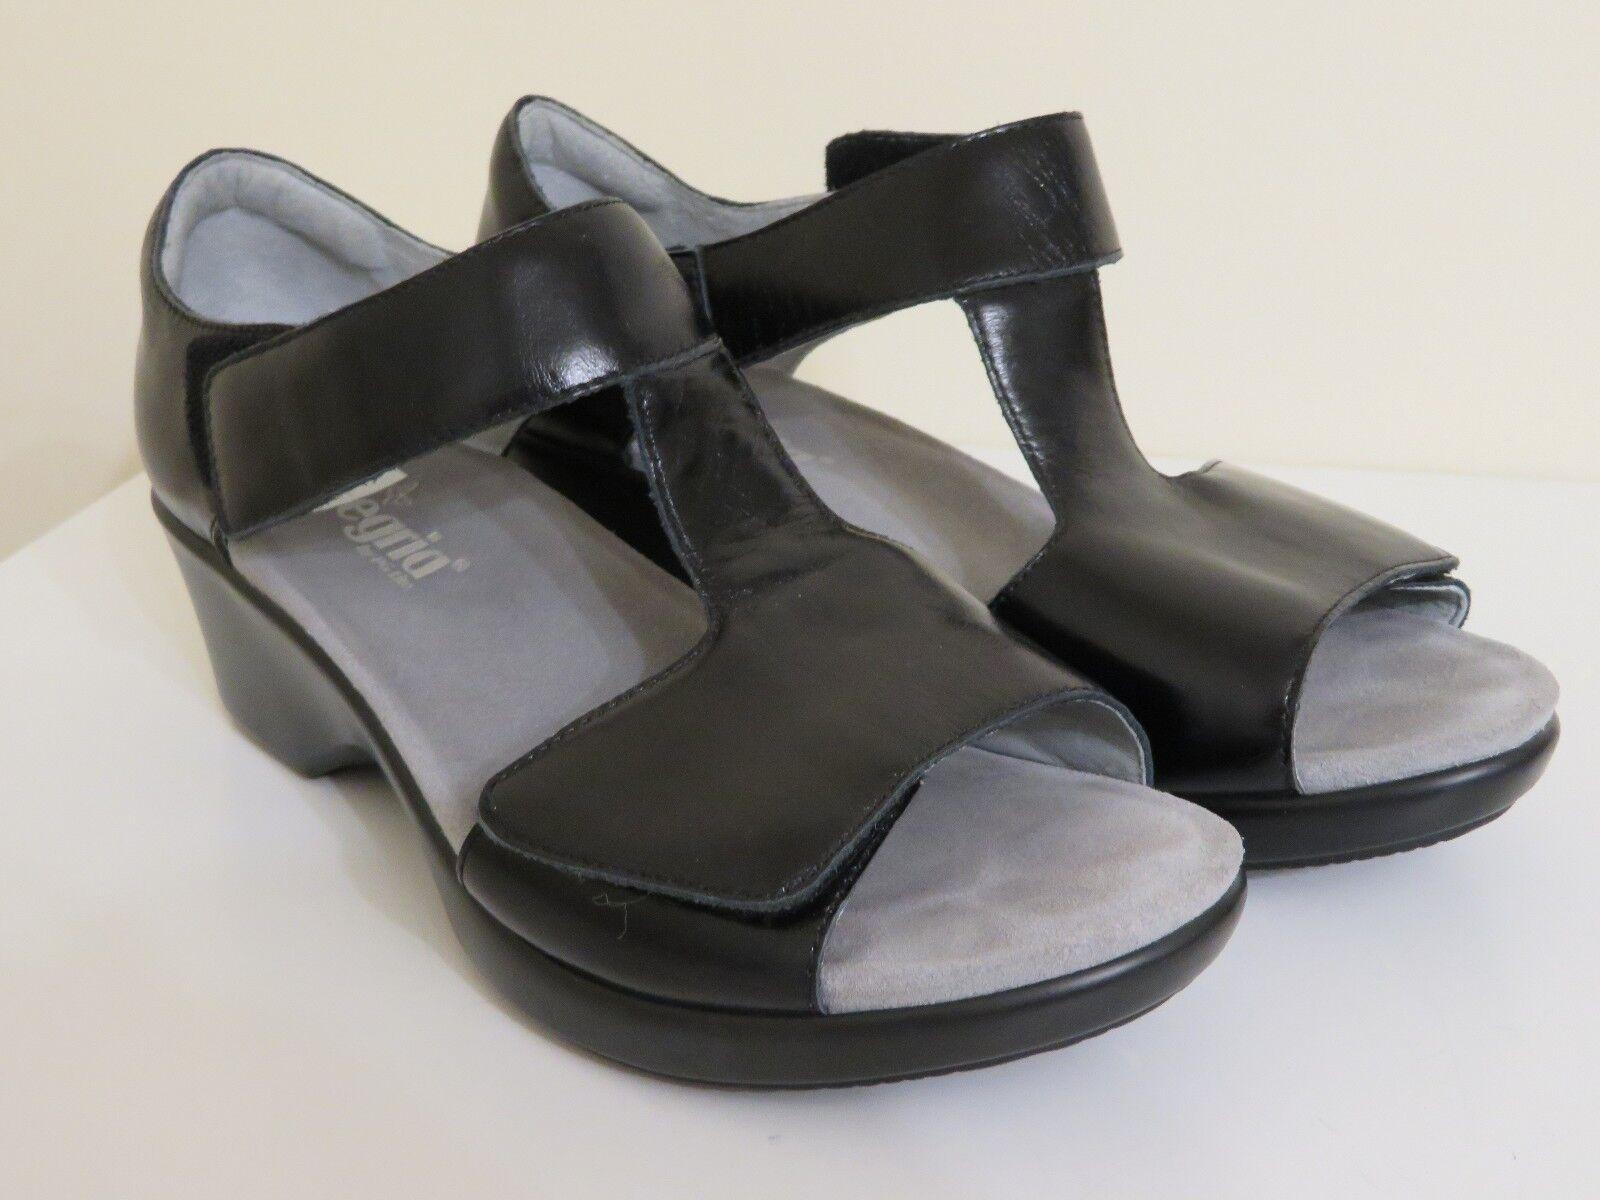 ALEGRIA LEATHER RIKI BLACK HEELED SANDAL Schuhe NEU 41 FITS 11 TO 11 1/2